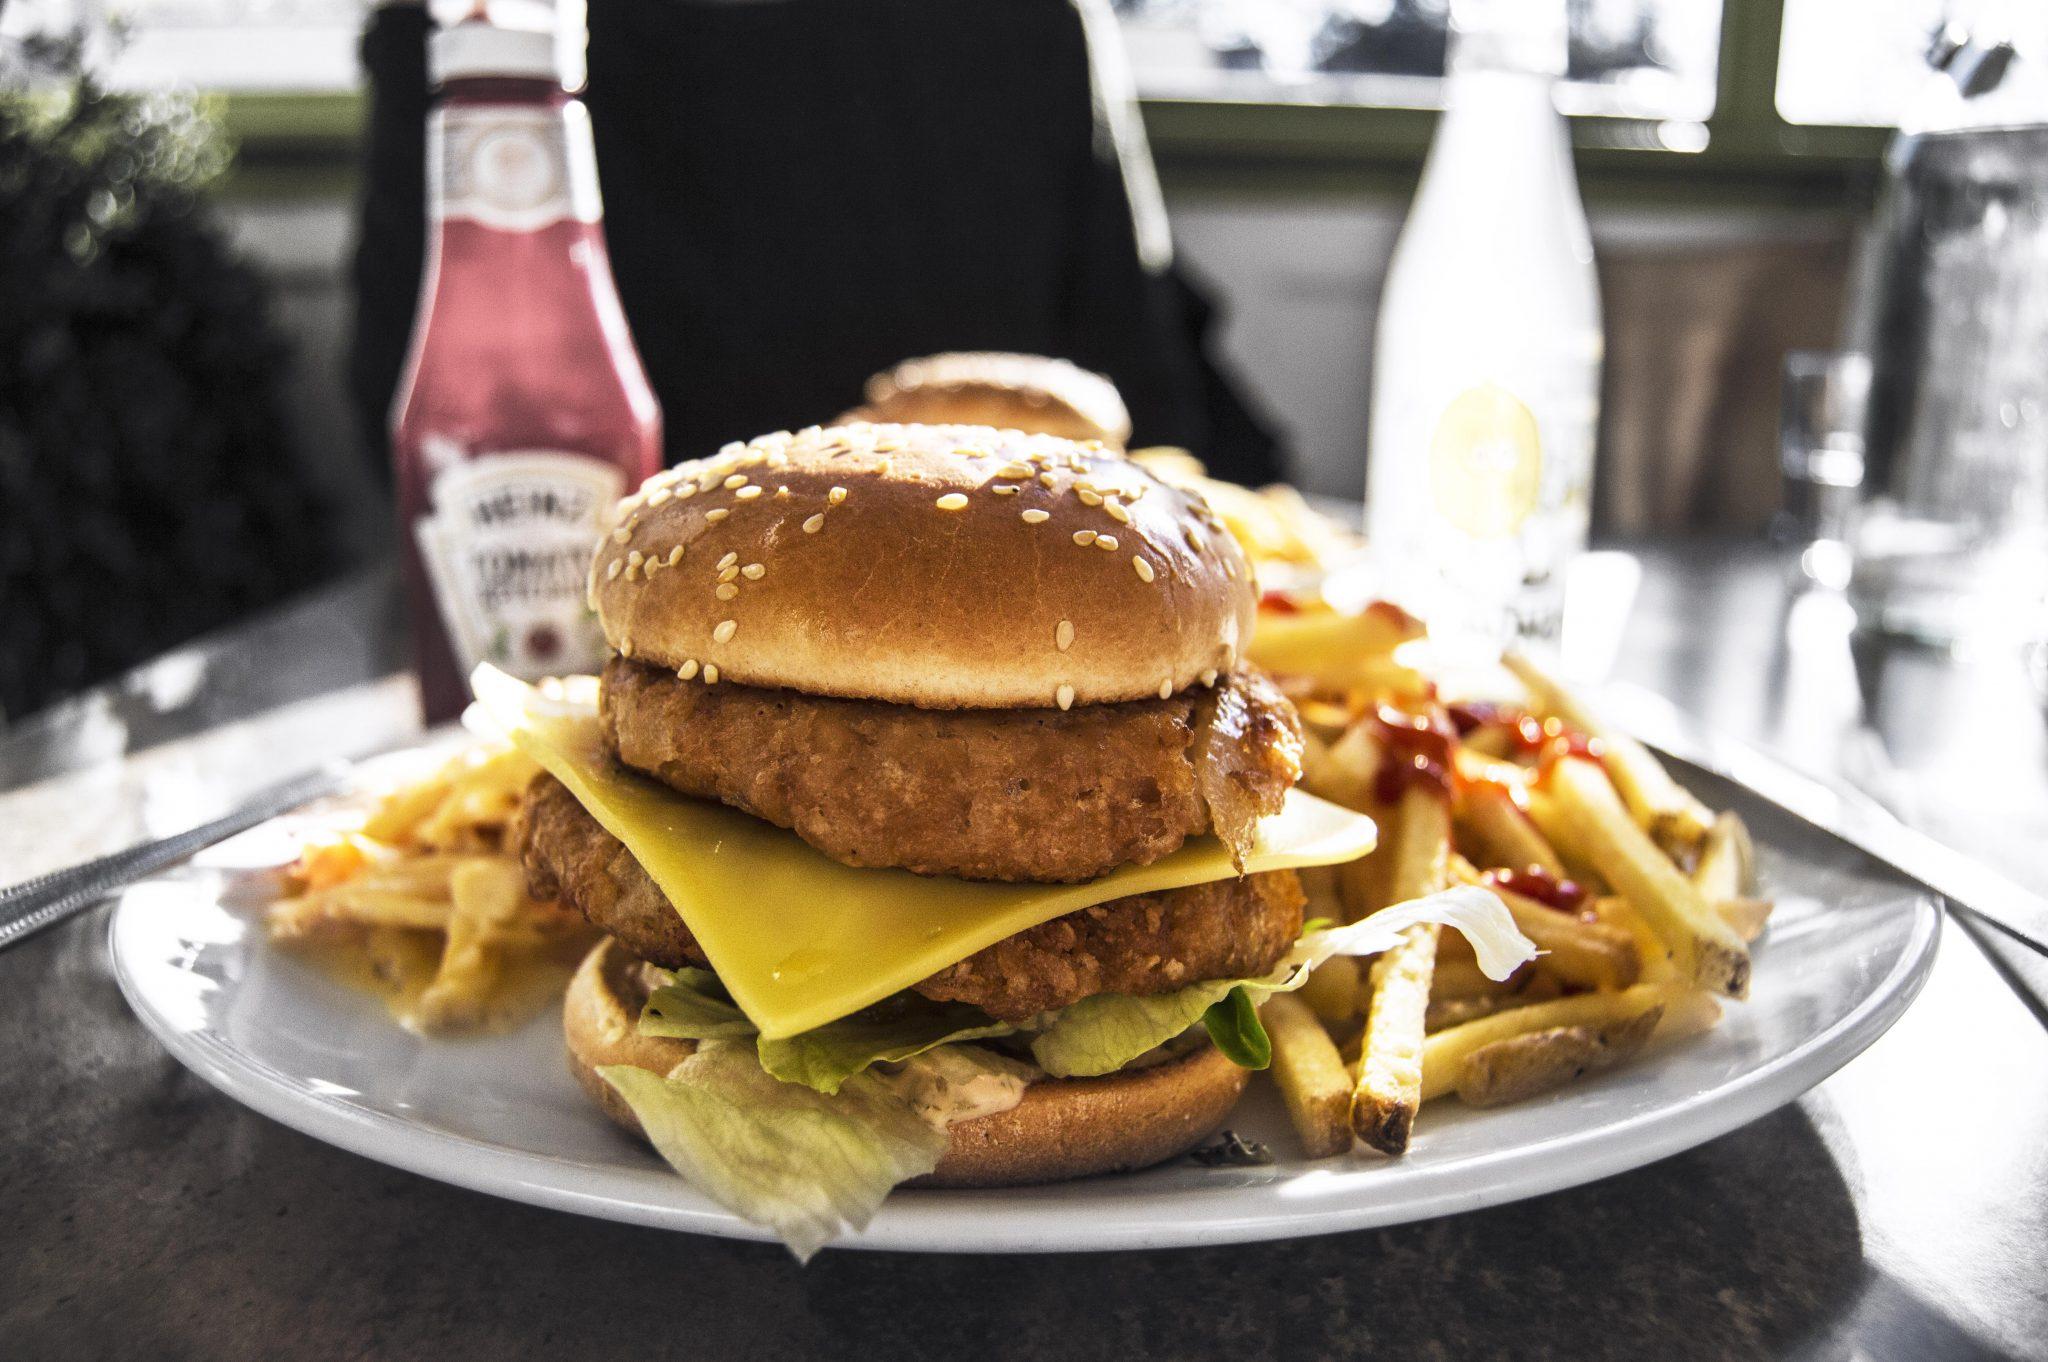 A Vegan In London – Double Veggie Burgers in Brixton